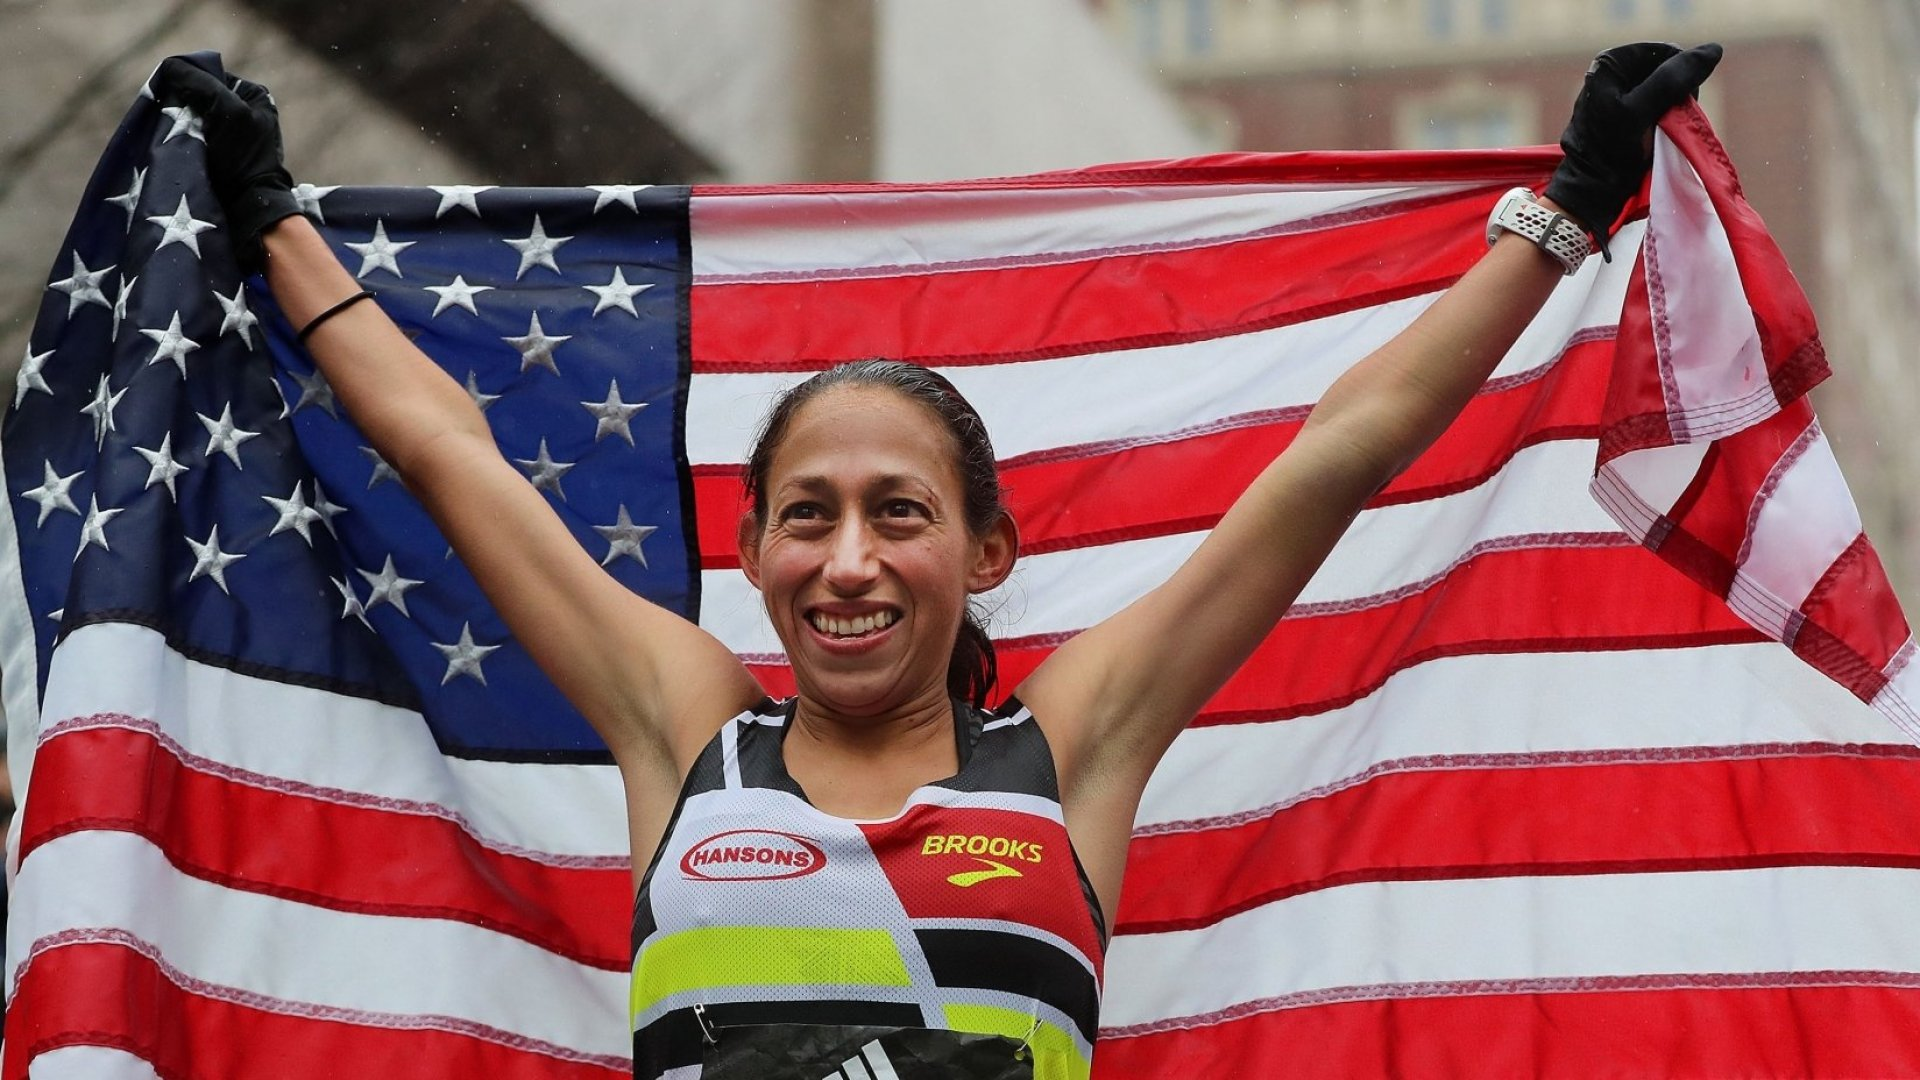 2018 Boston Marathon women's winner Desiree Linden celebrates after she crosses the finish line on April 16, 2018.